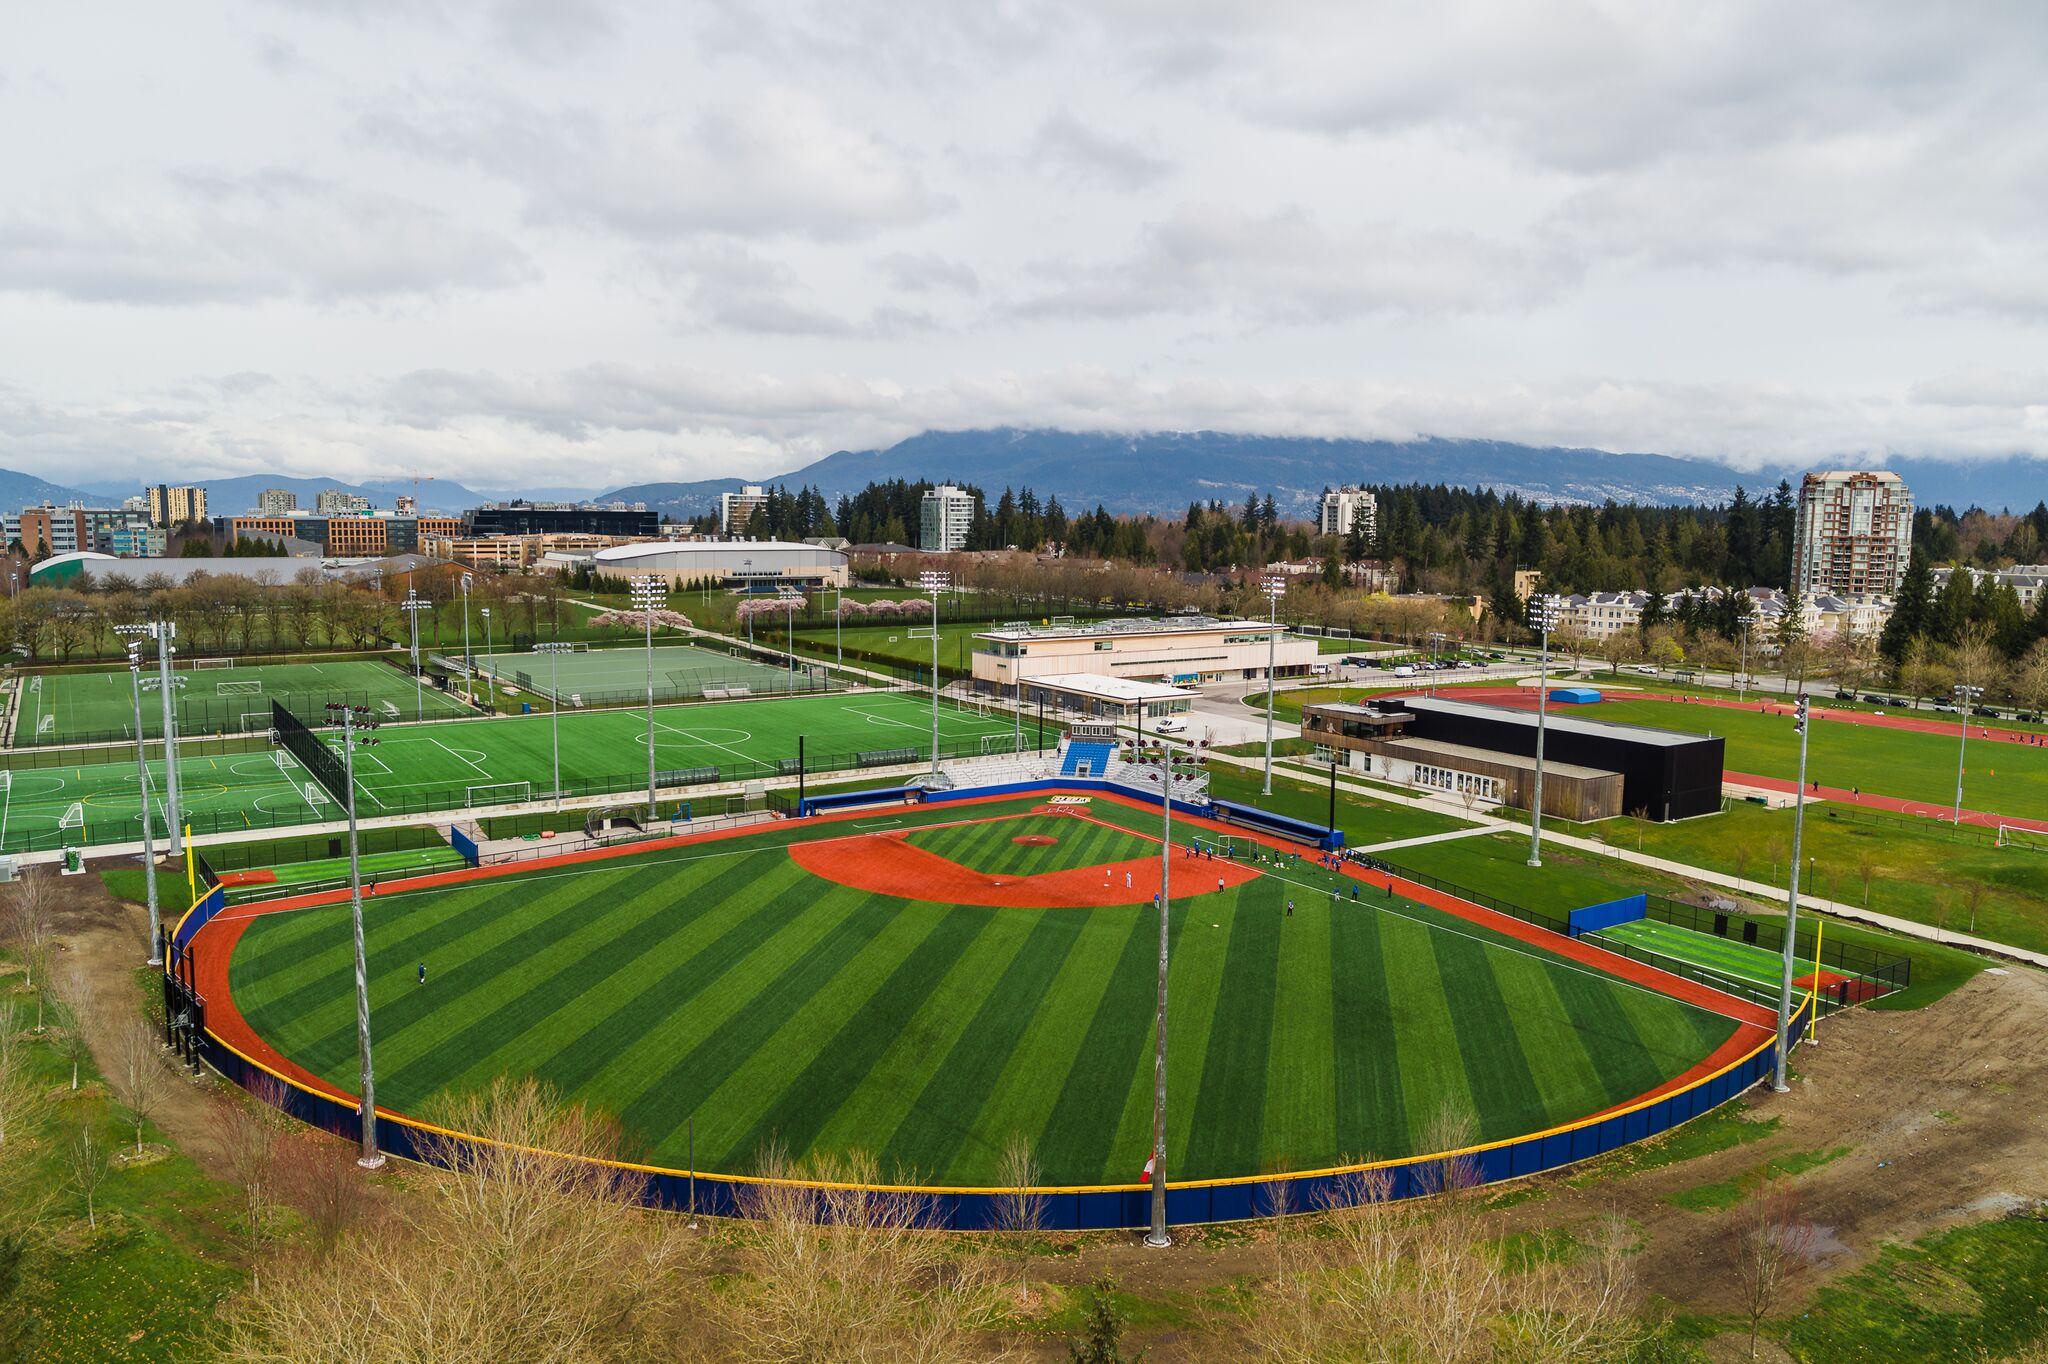 Ubc baseball stadium 7